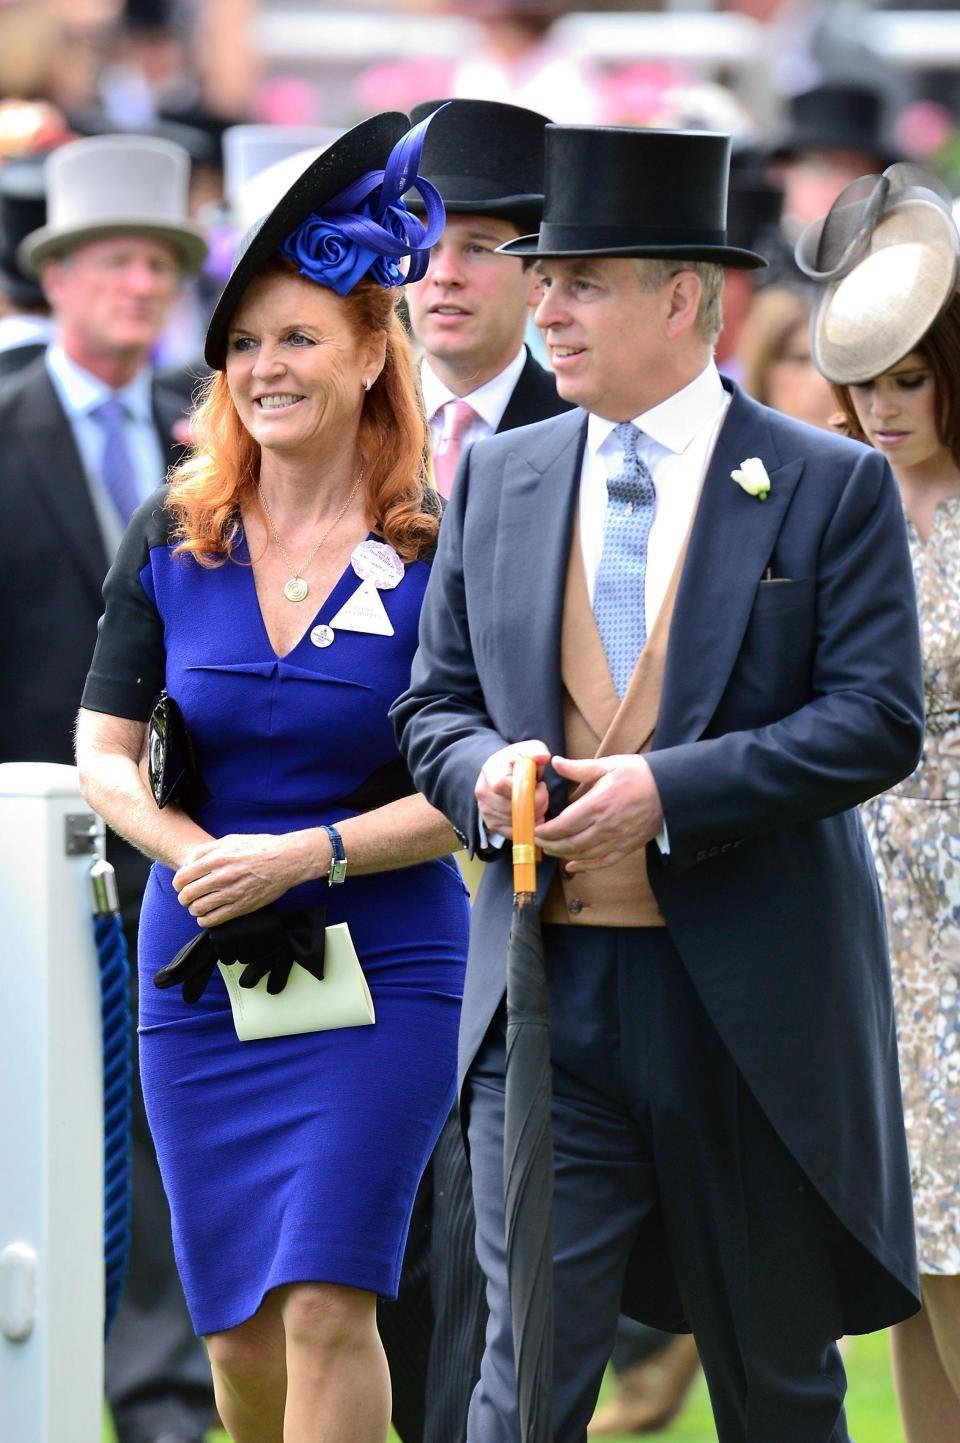 The lowdown on Sarah Ferguson and Prince Andrew's